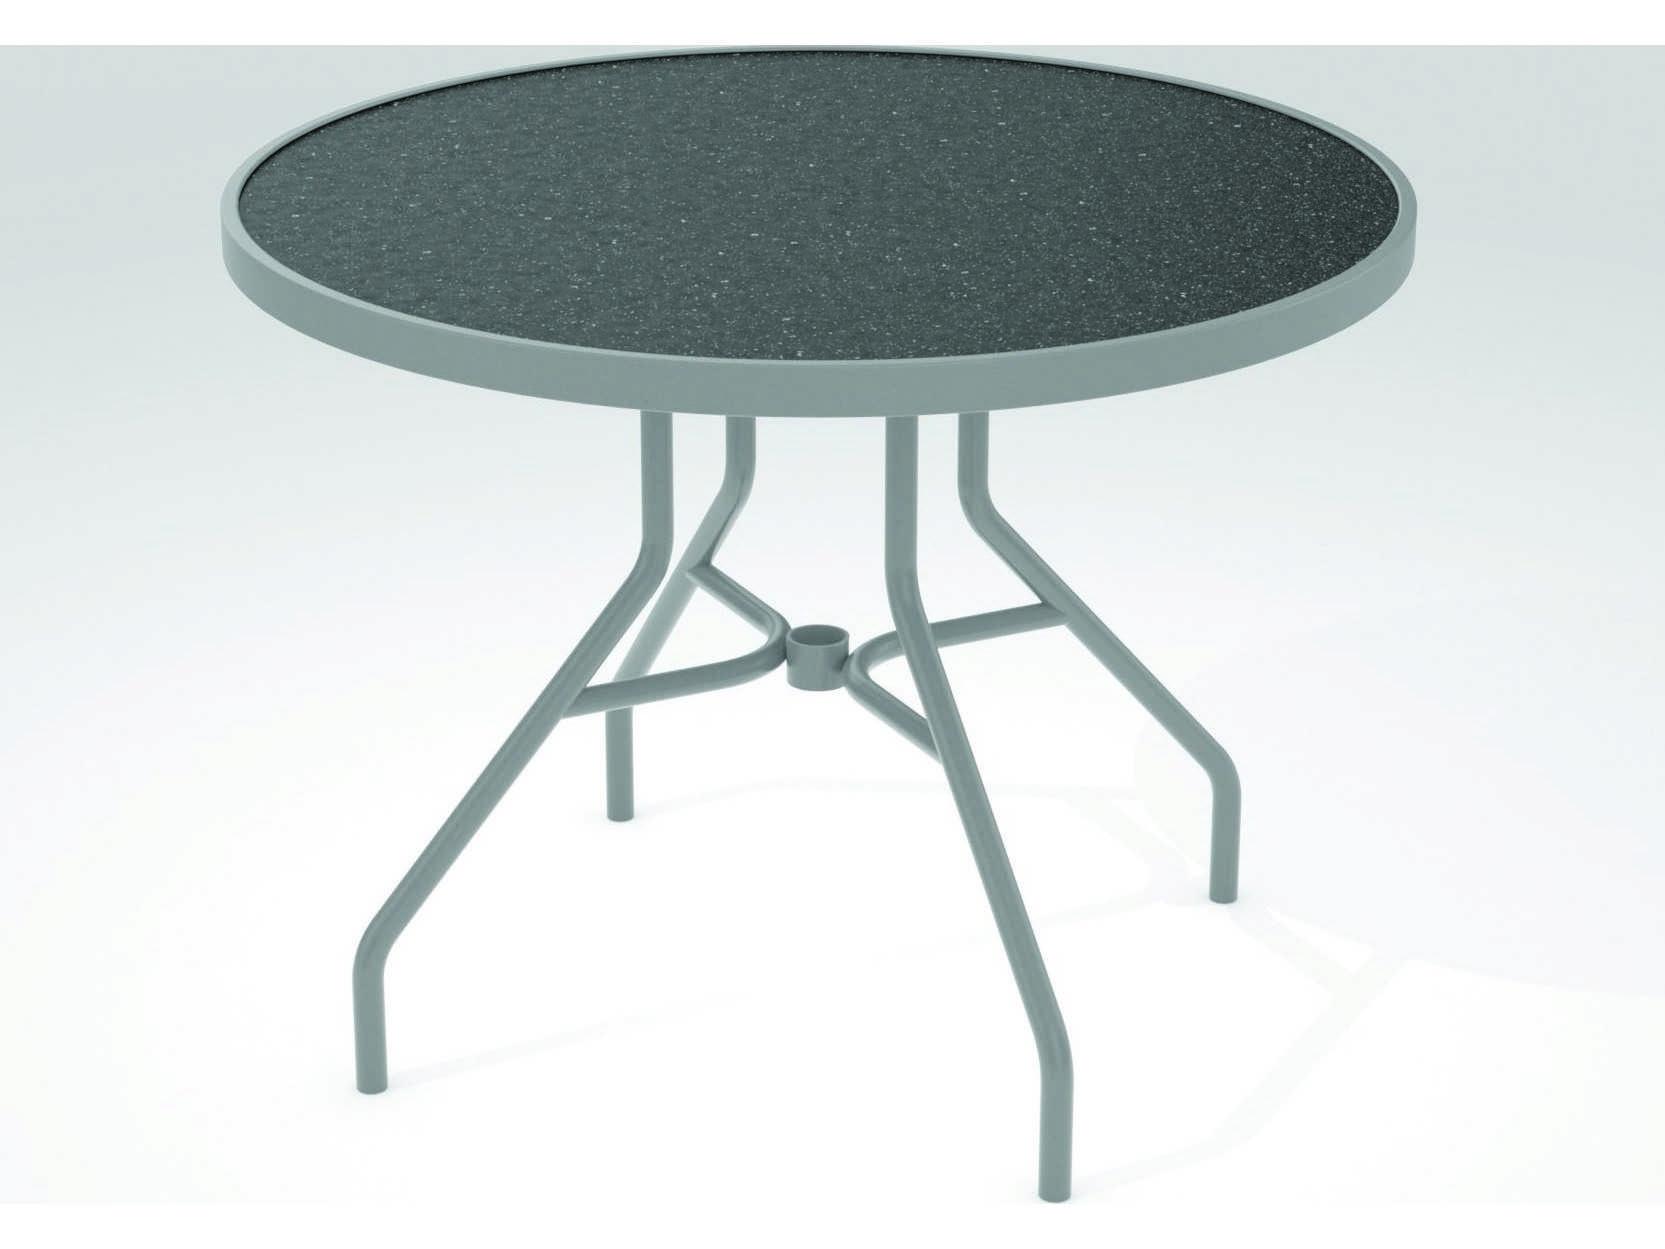 Tropitone Hpl Raduno Aluminum 36 Round Dining Table 670h